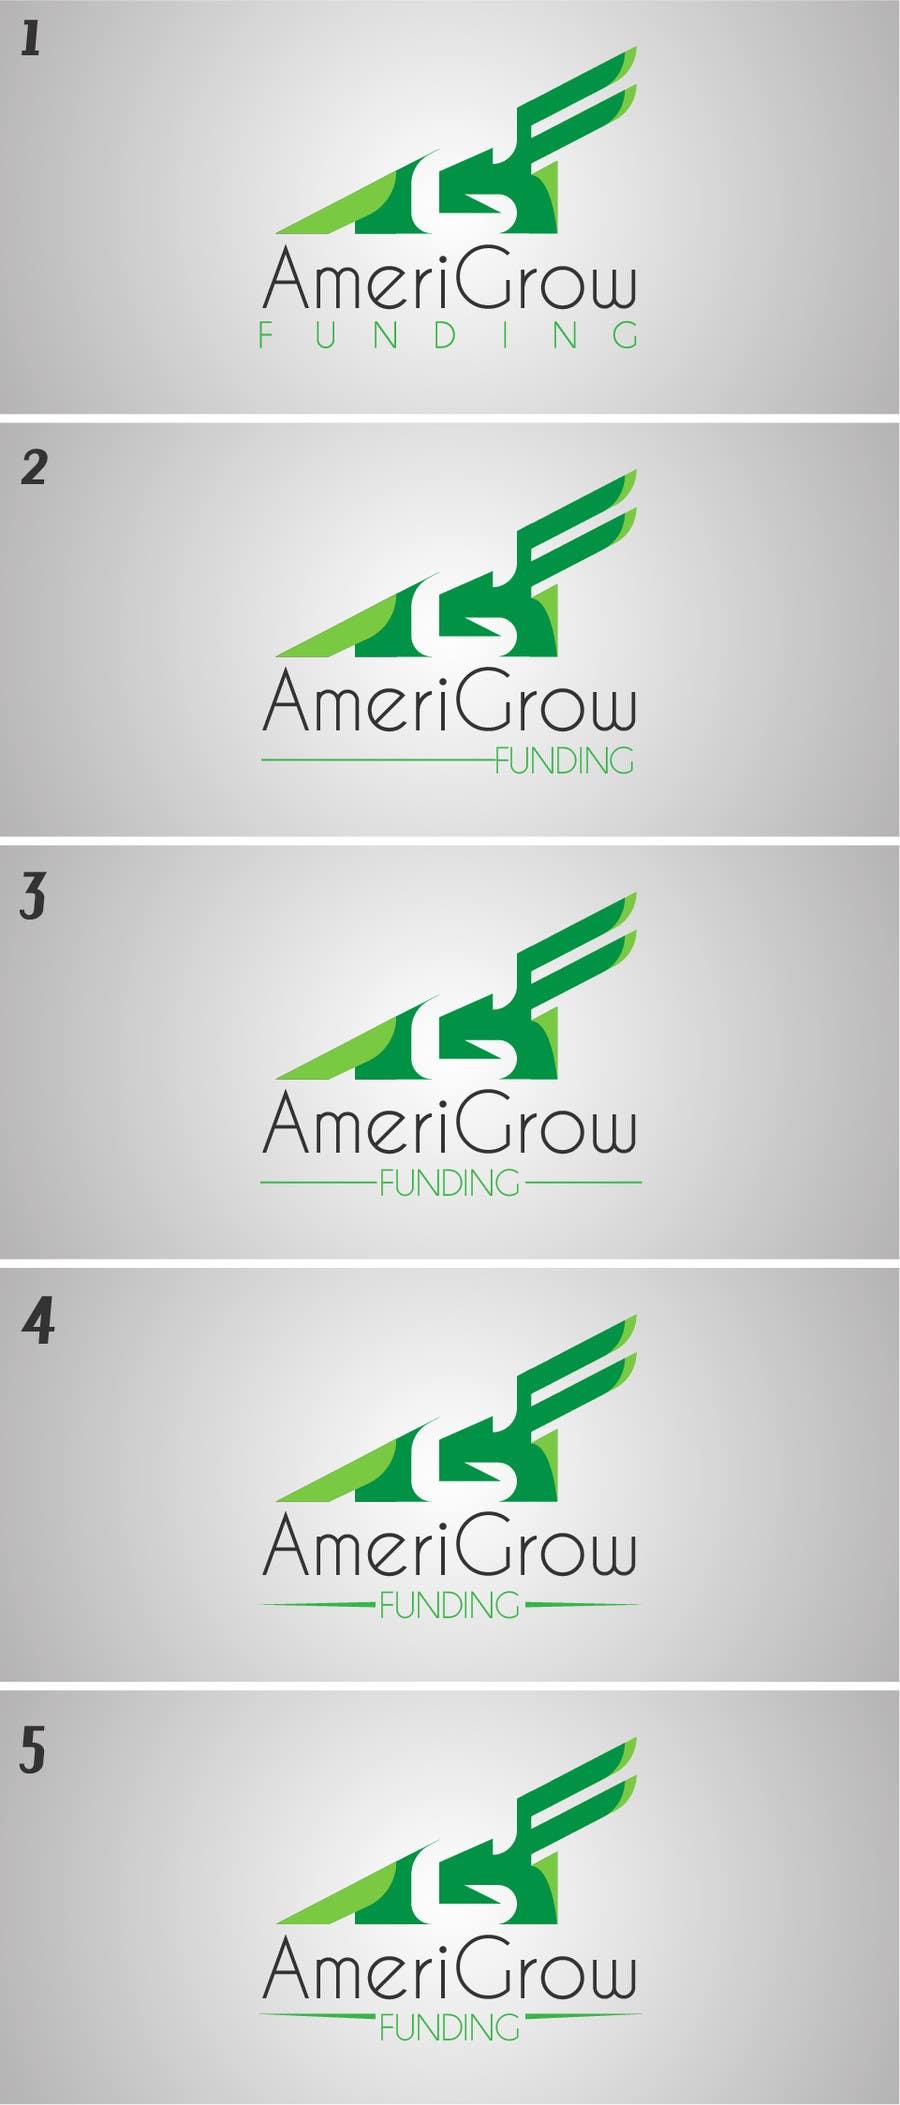 Kilpailutyö #108 kilpailussa Design a Logo for Funding Company